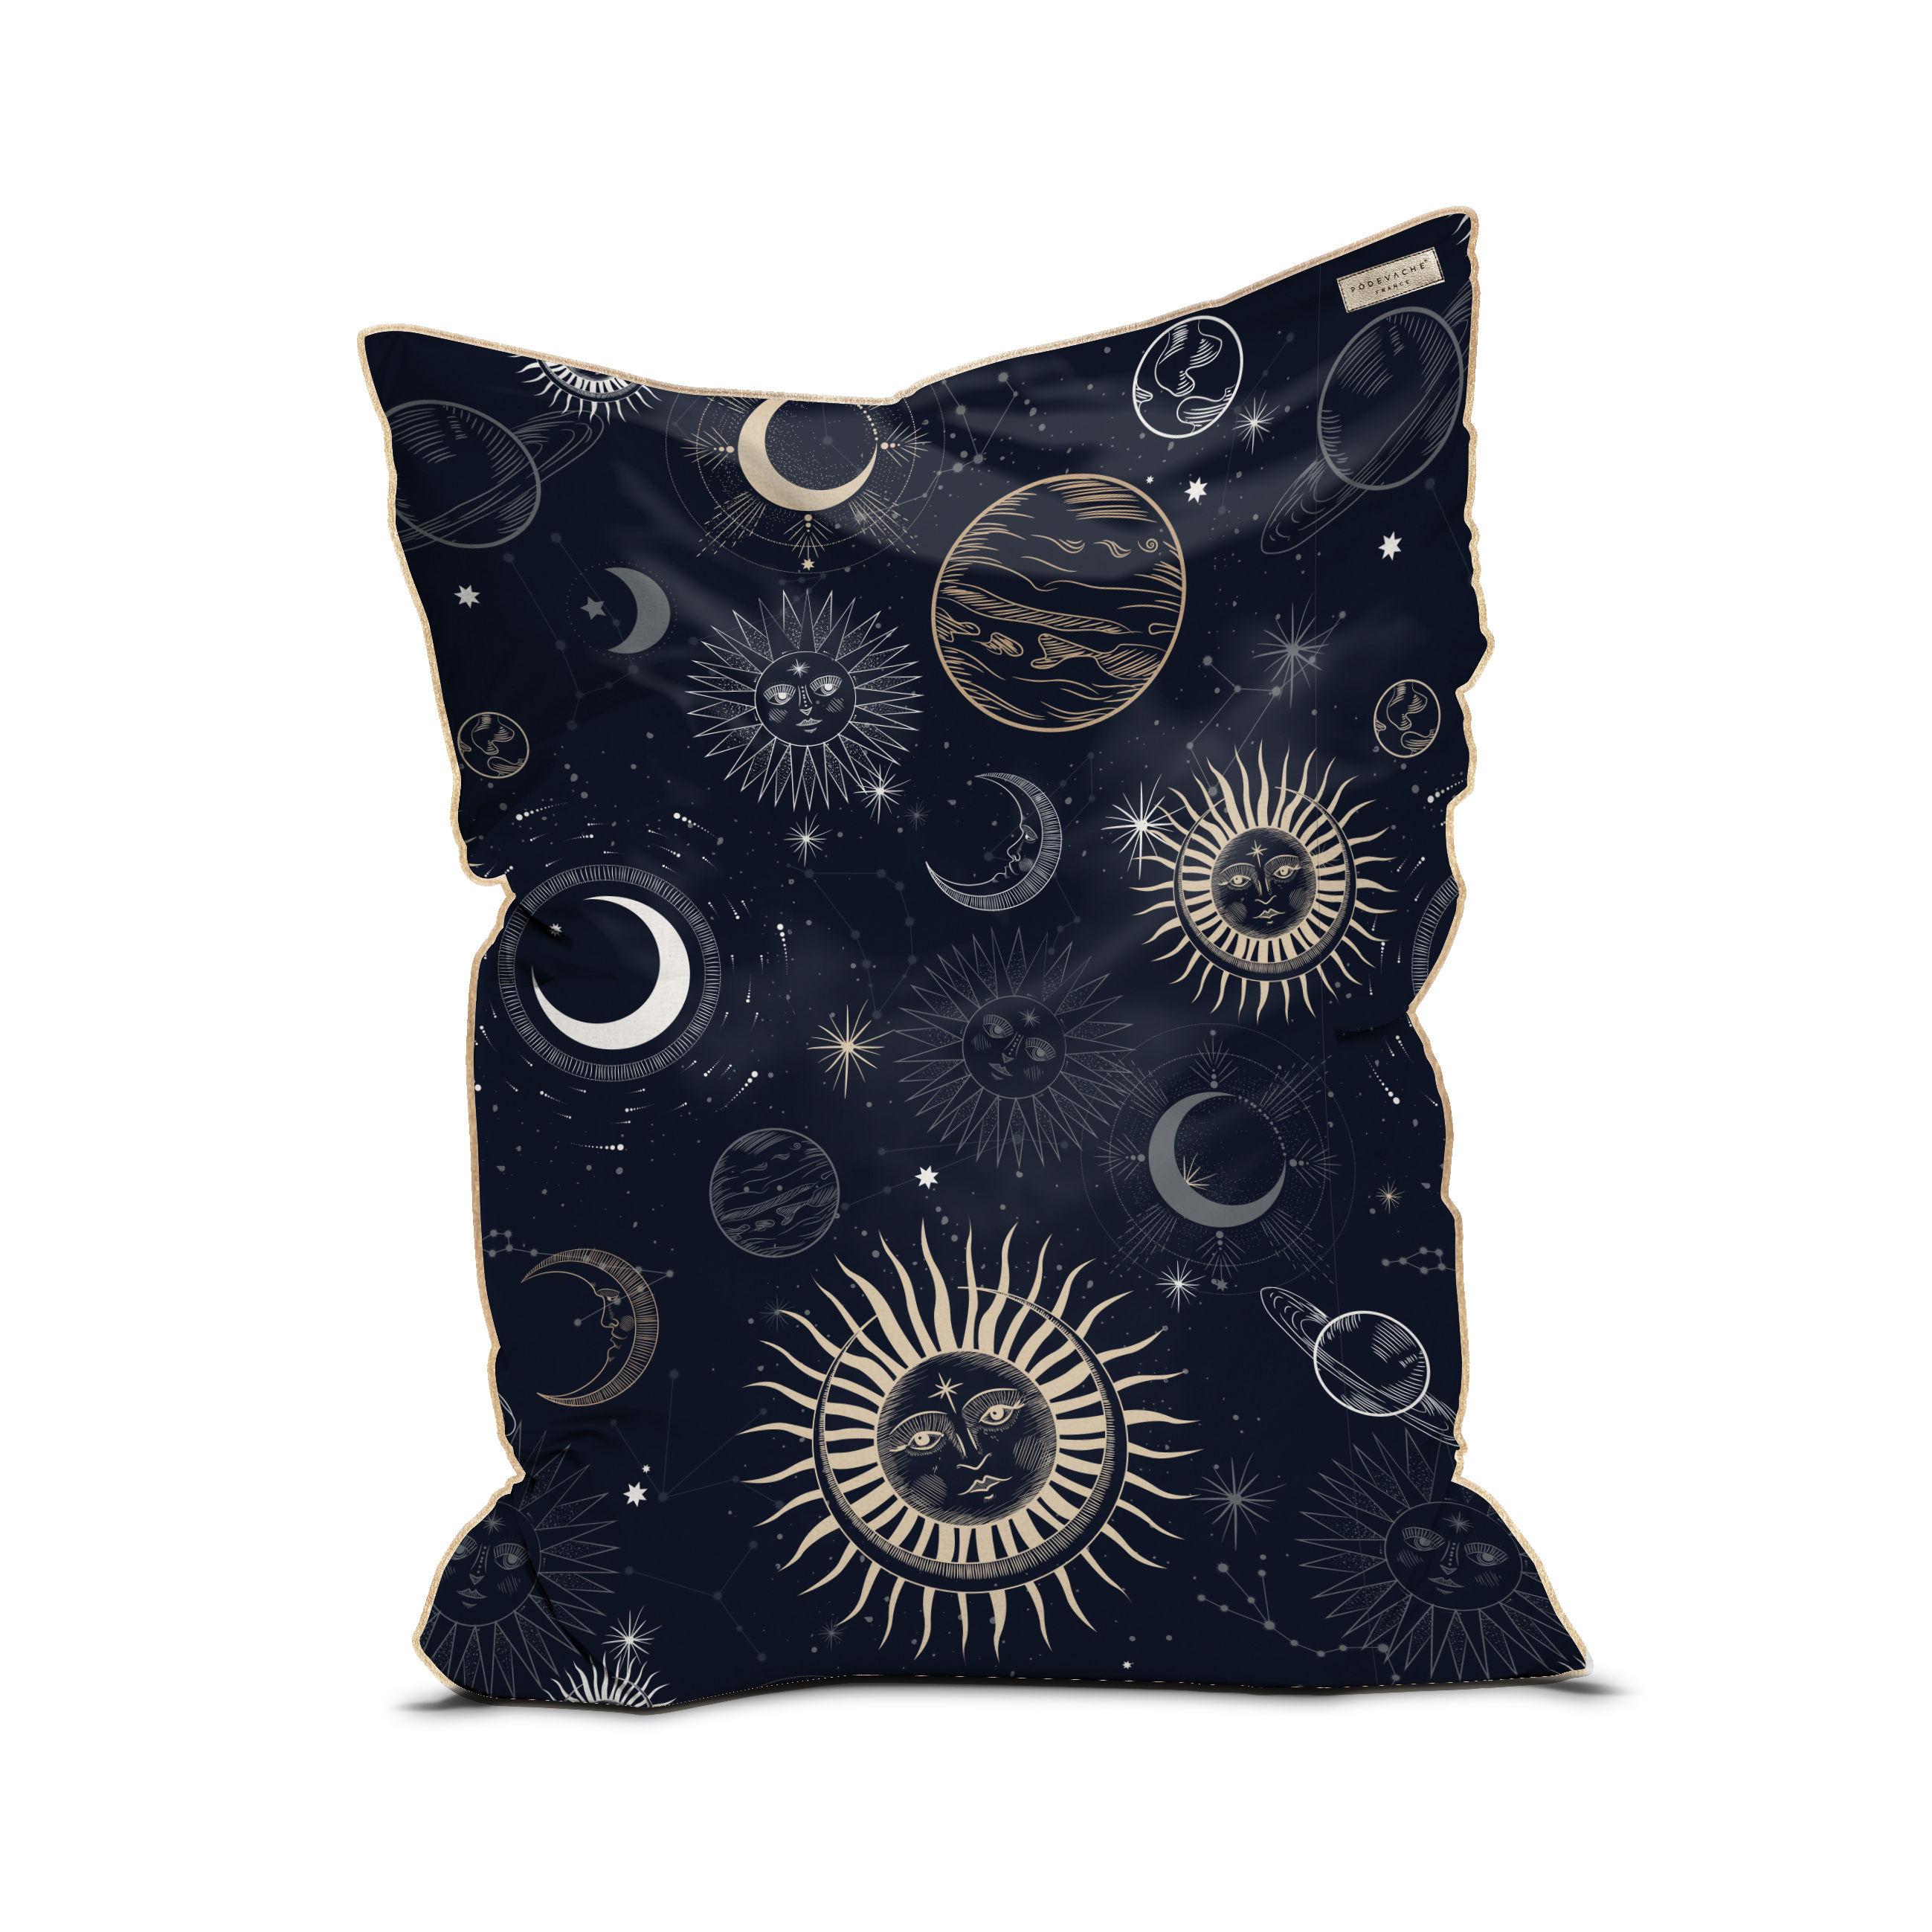 Furniture - Poufs & Floor Cushions - Moon Party Pouf - / Velvet - 115 x 145 cm by PÔDEVACHE - Blue - EPS balls, Fabric, Velvet